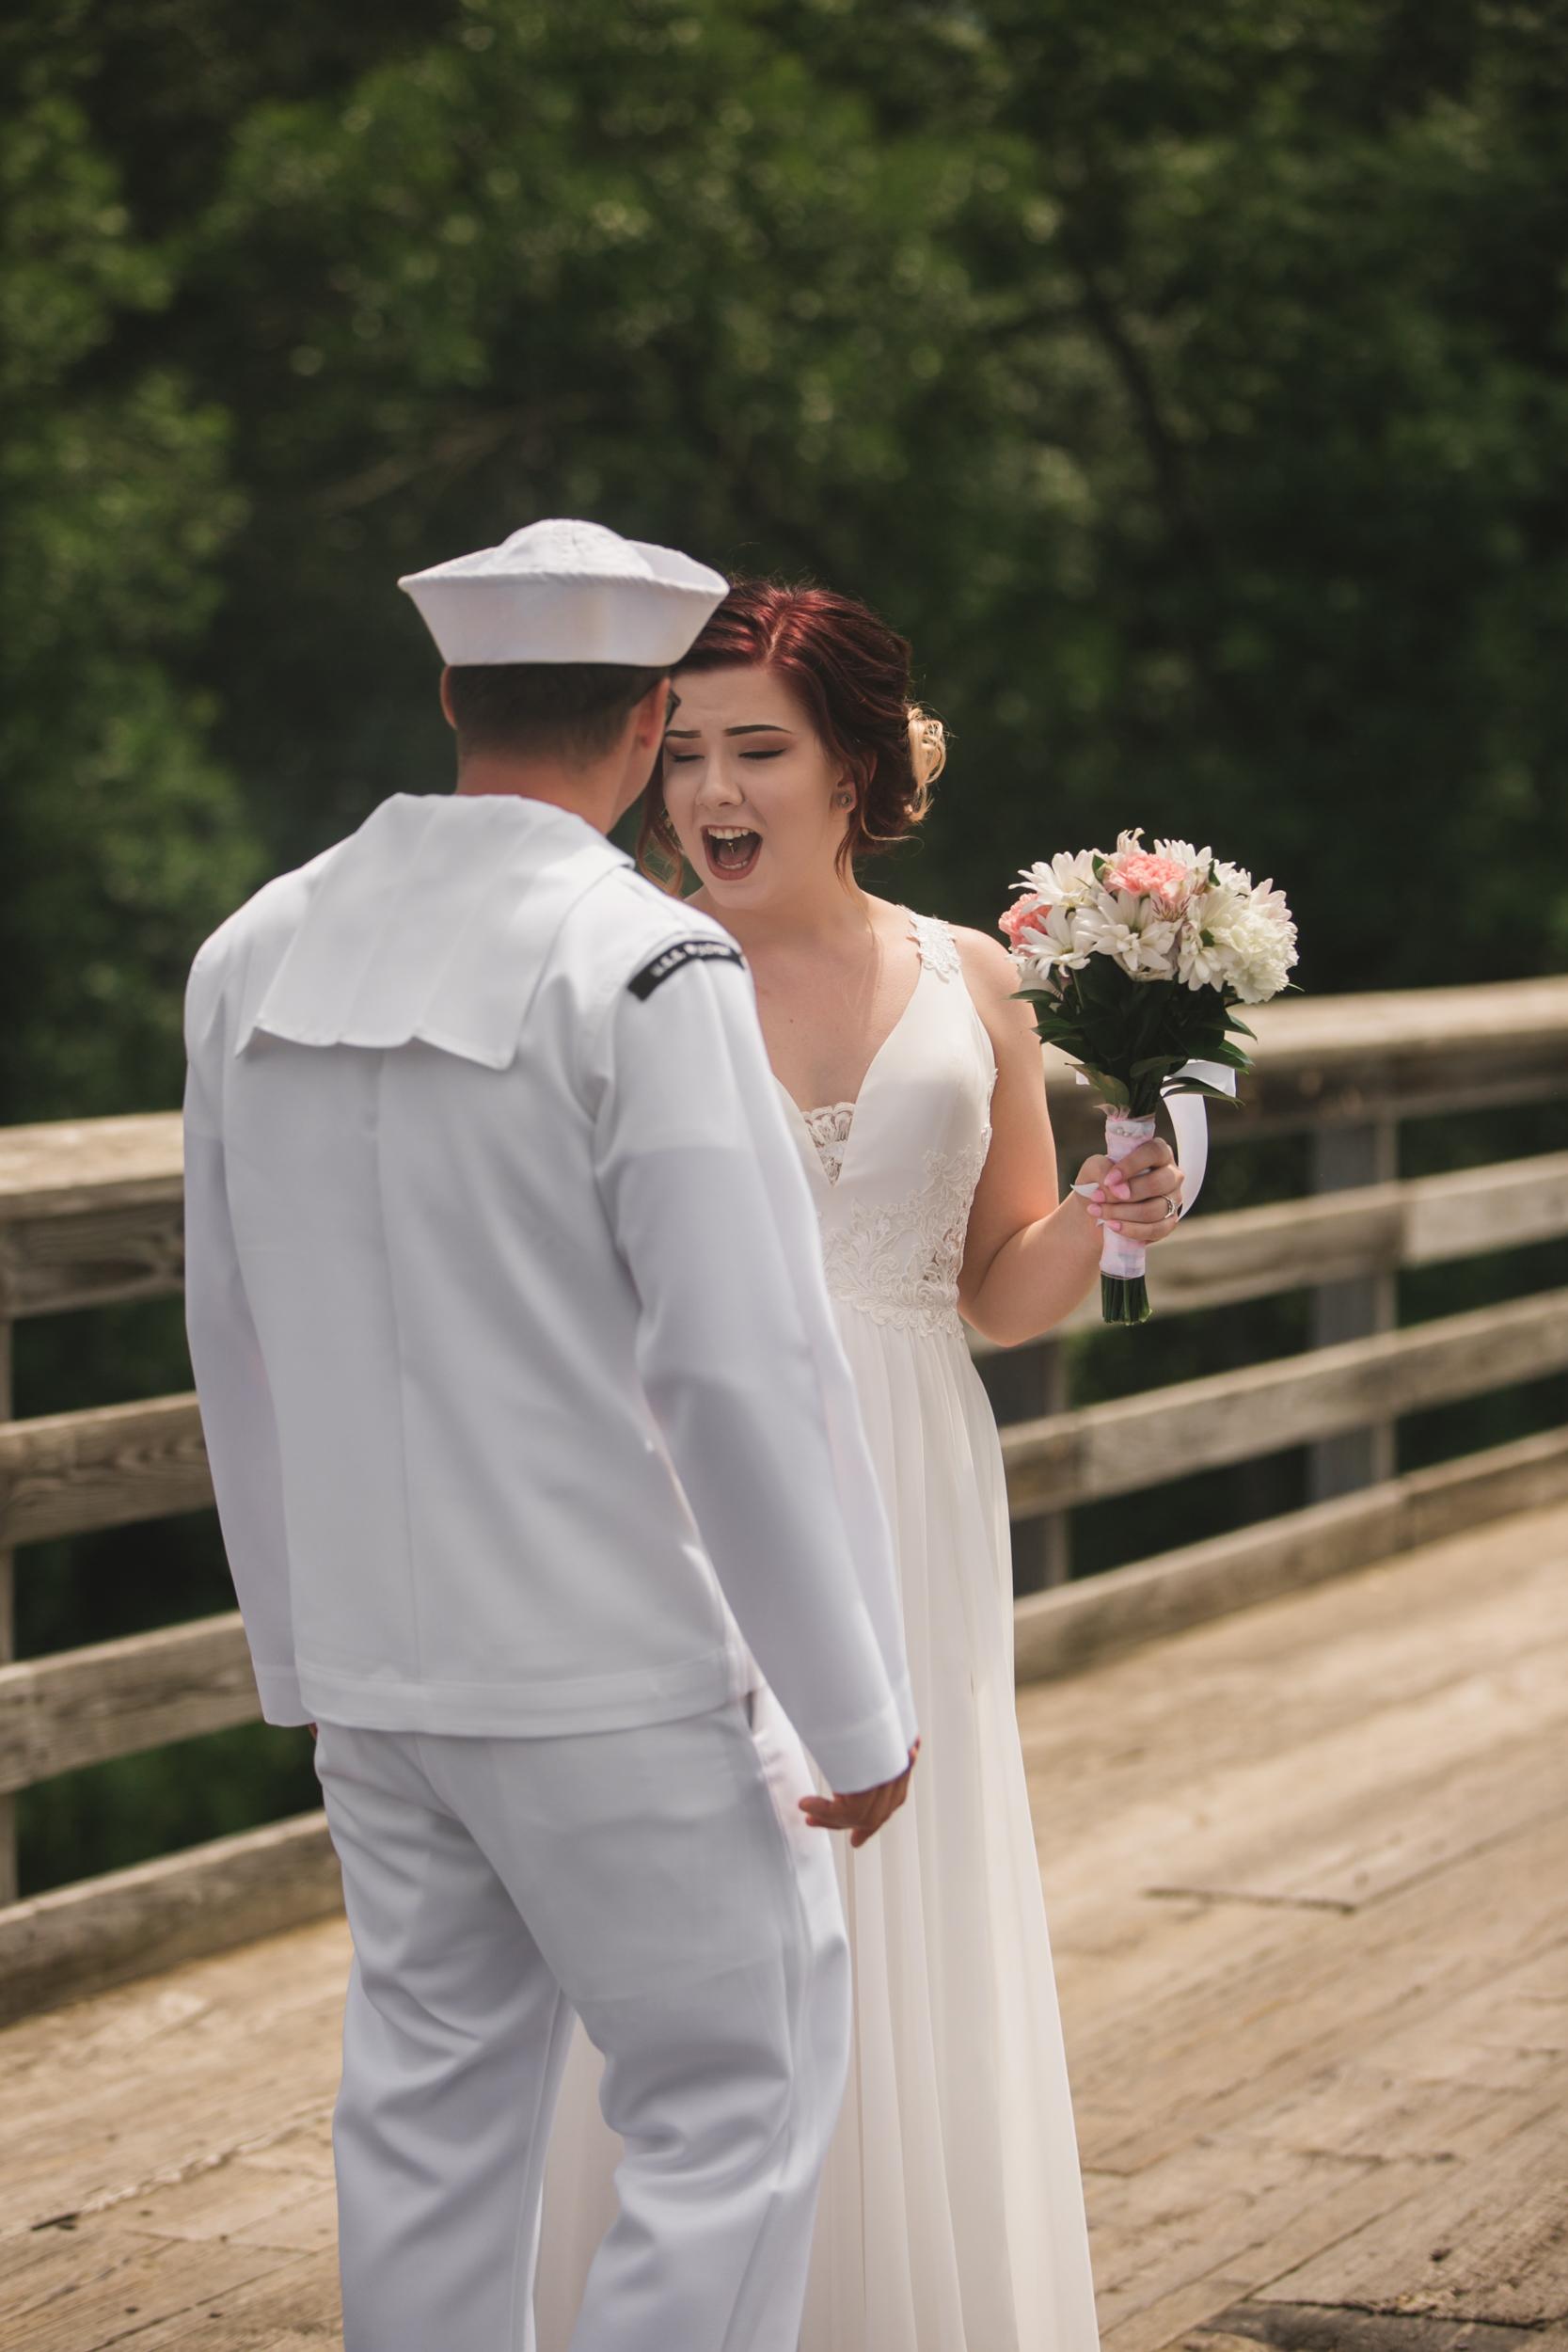 intimate elopement wedding, duluth mn, duluth mn elopement wedding, -www.rachelsmak.com14.jpg